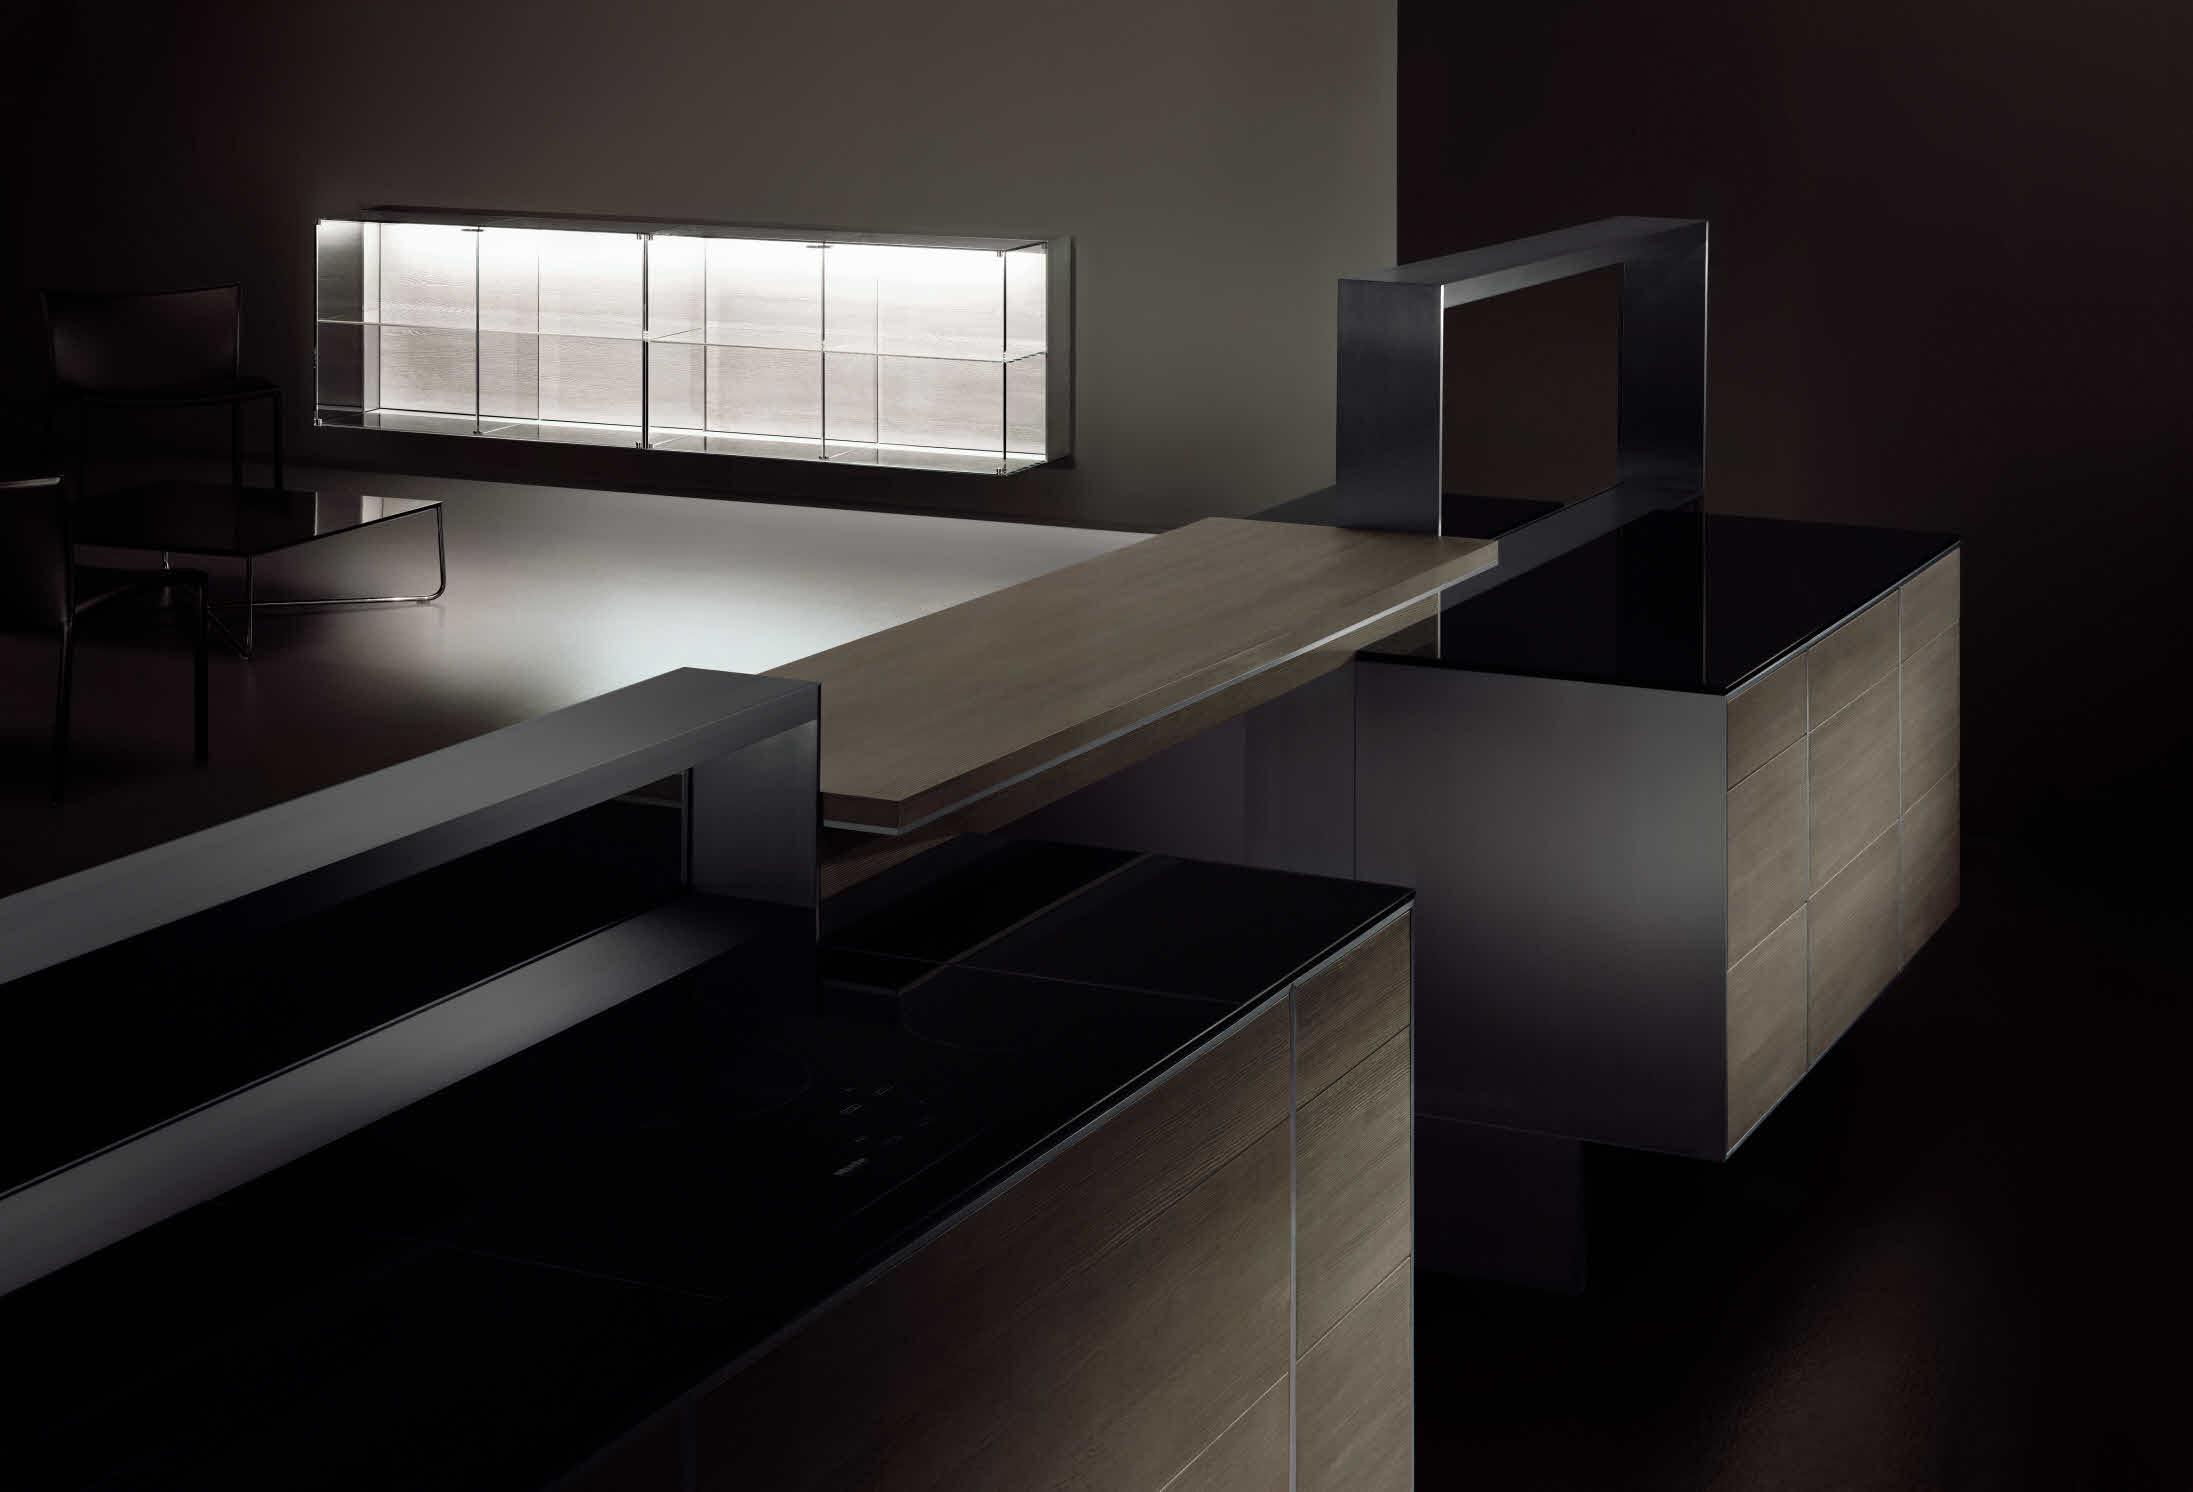 Porsche Design Keuken : Poggenpohl Porsche Design Kitchen P7340 ...